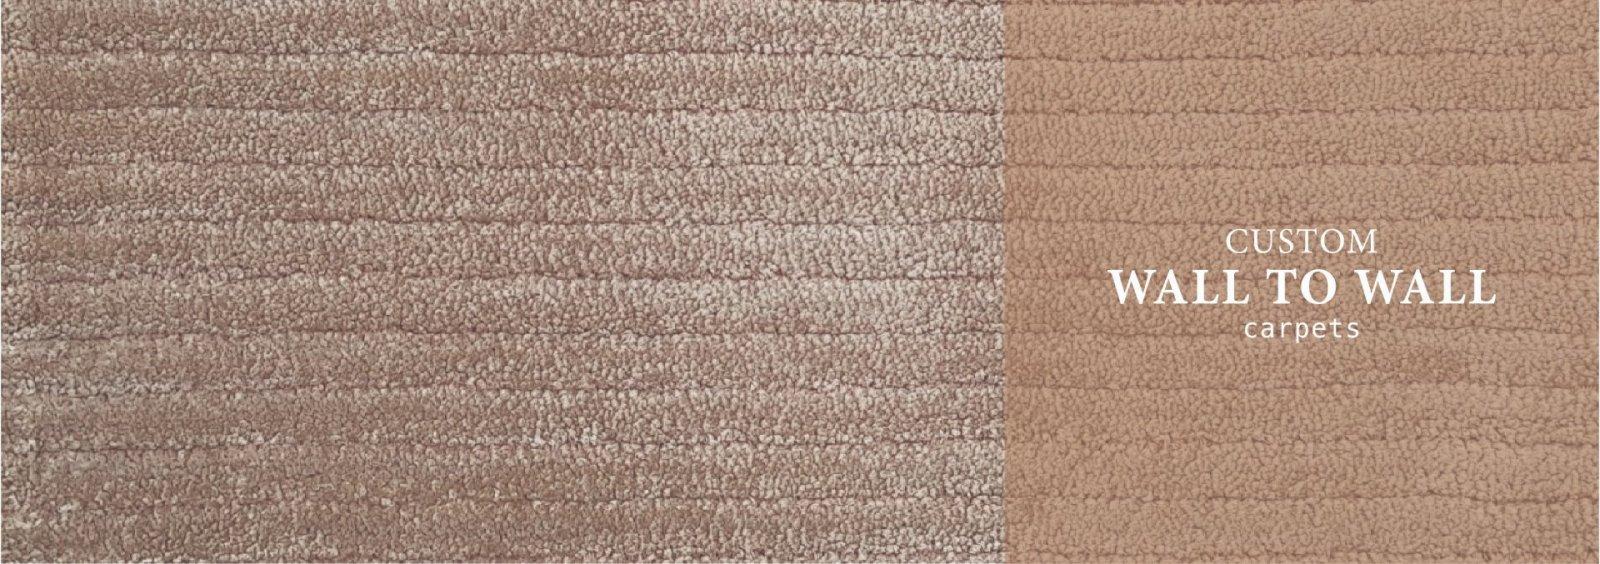 Custom Wall to Wall Carpet